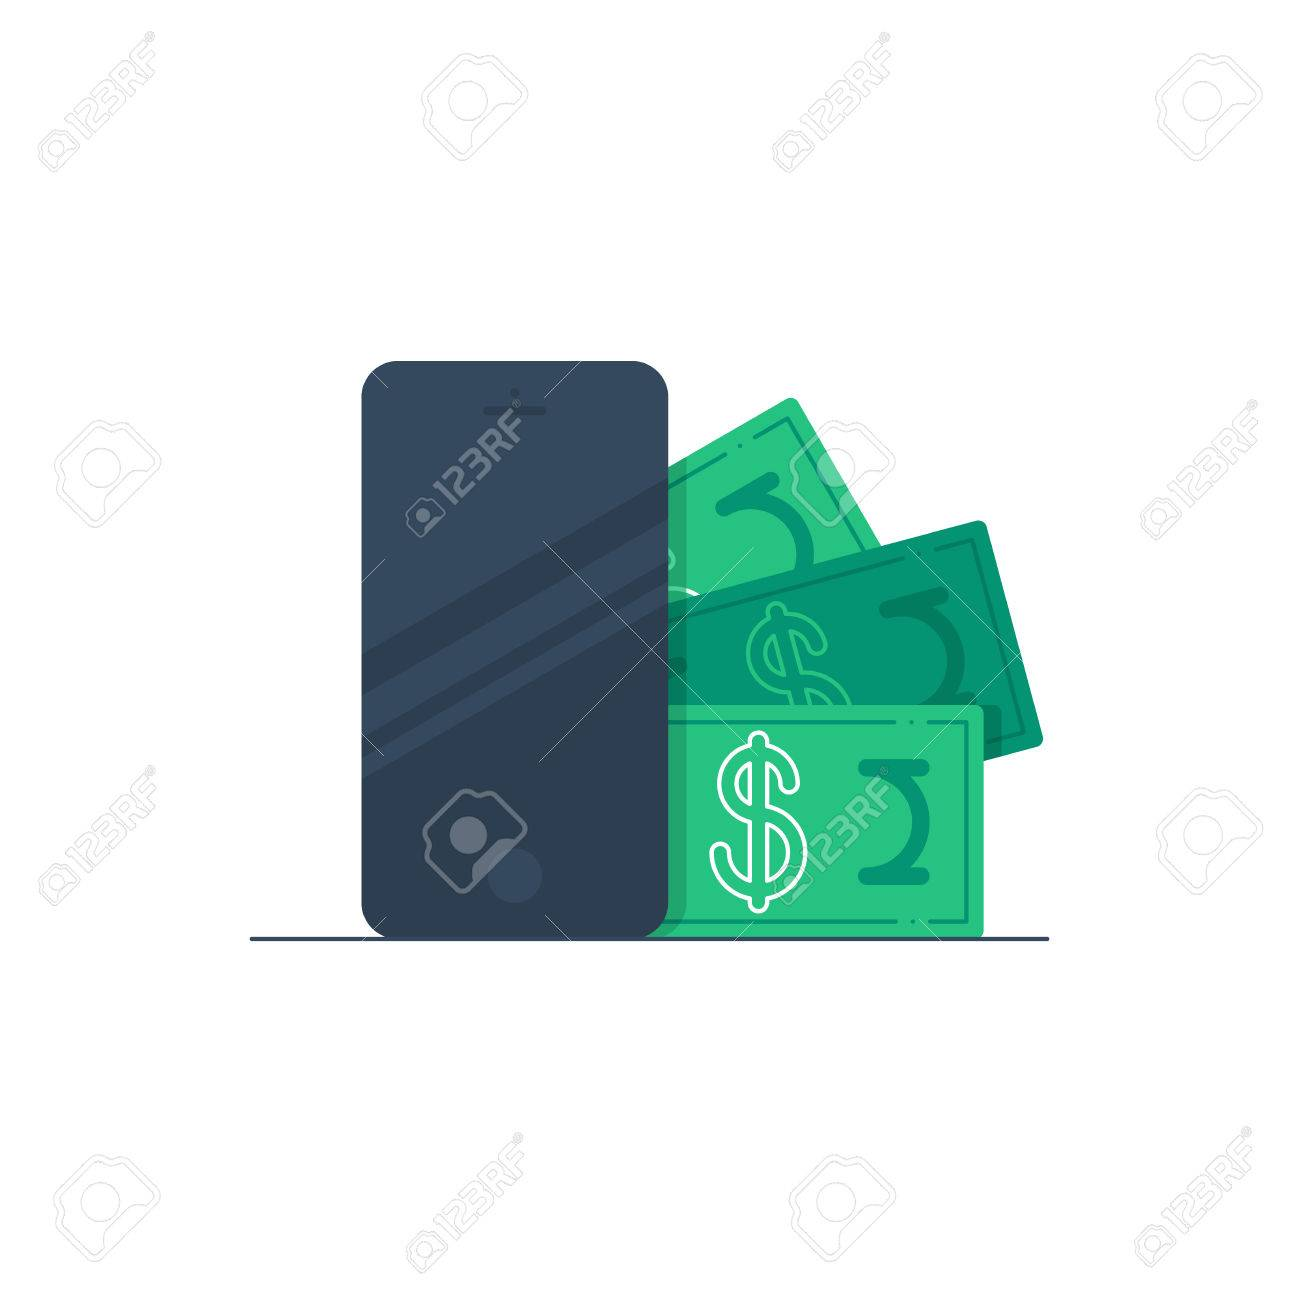 Bonus money on a phone. Mobile banking. - 49711880